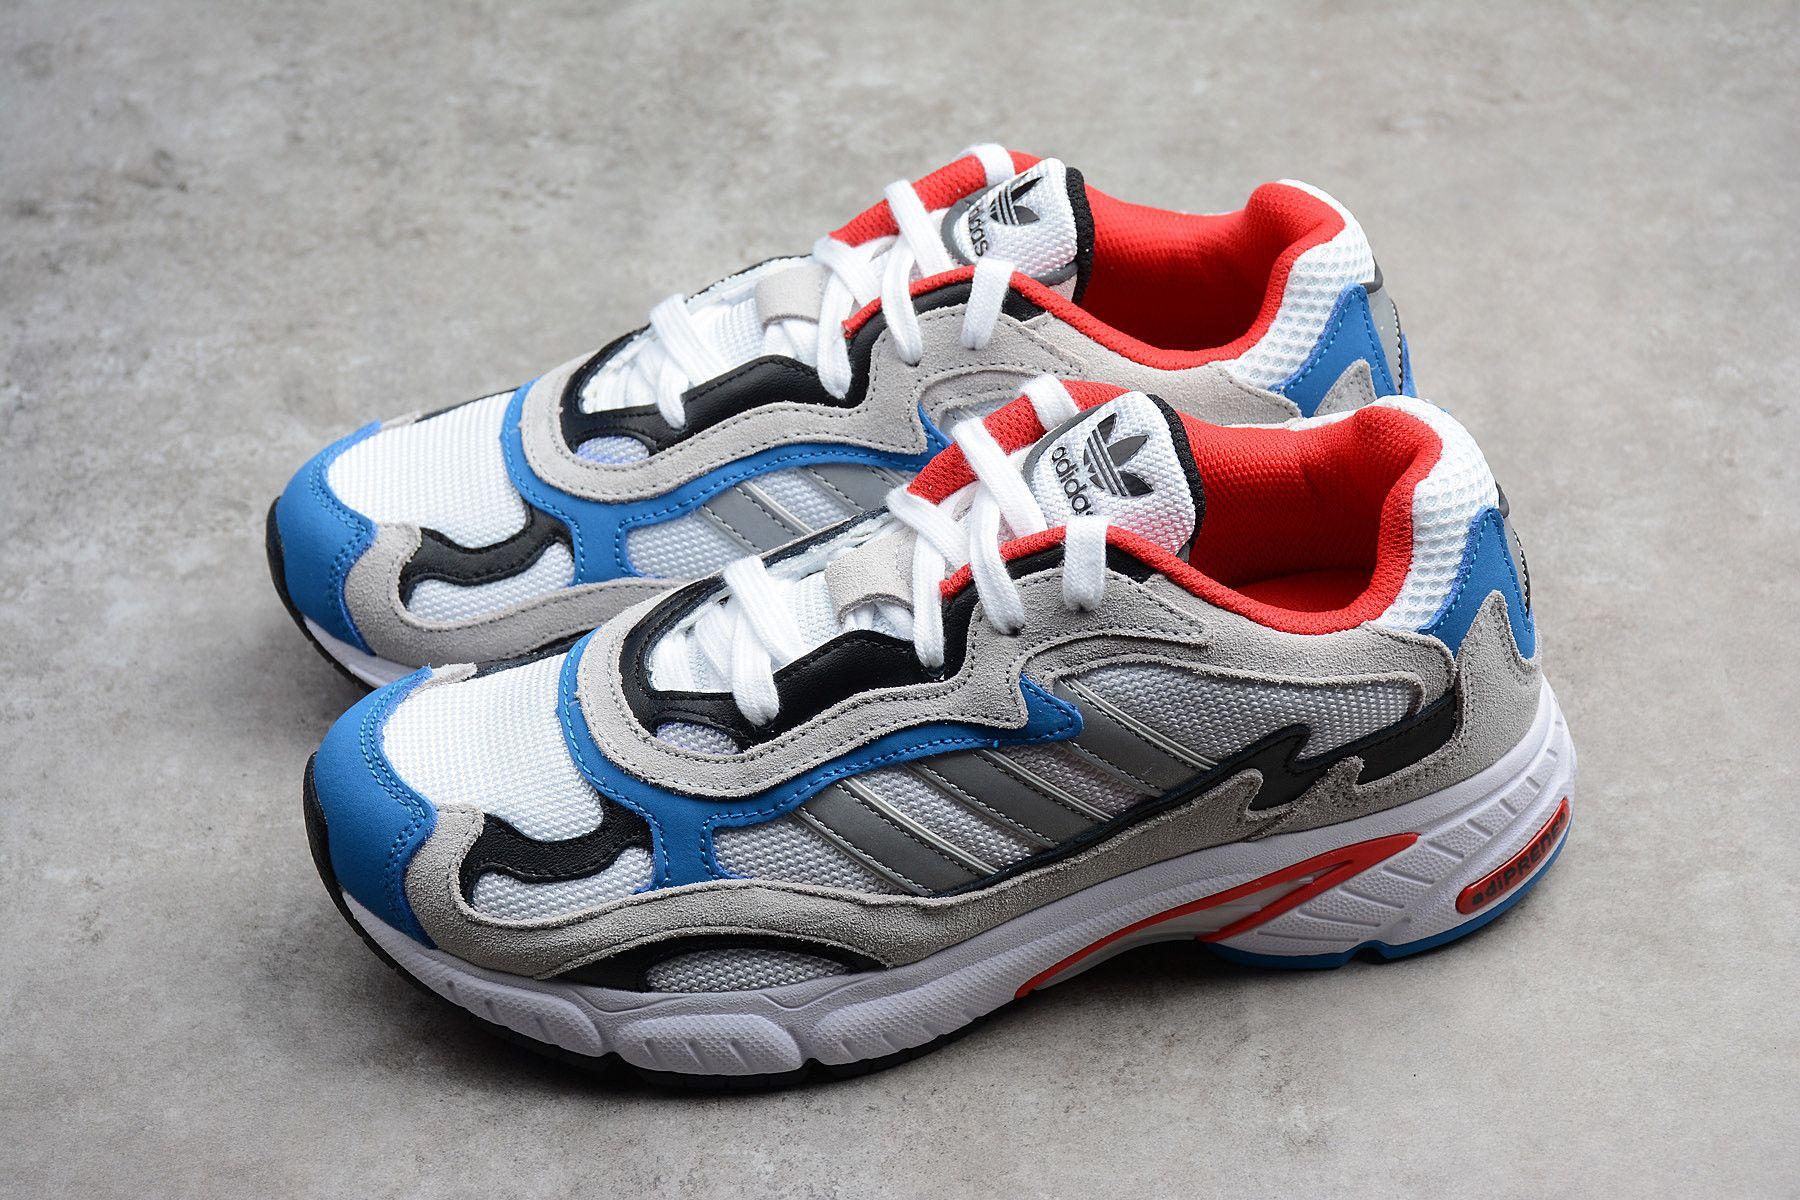 Adidas Temper Running Man red white